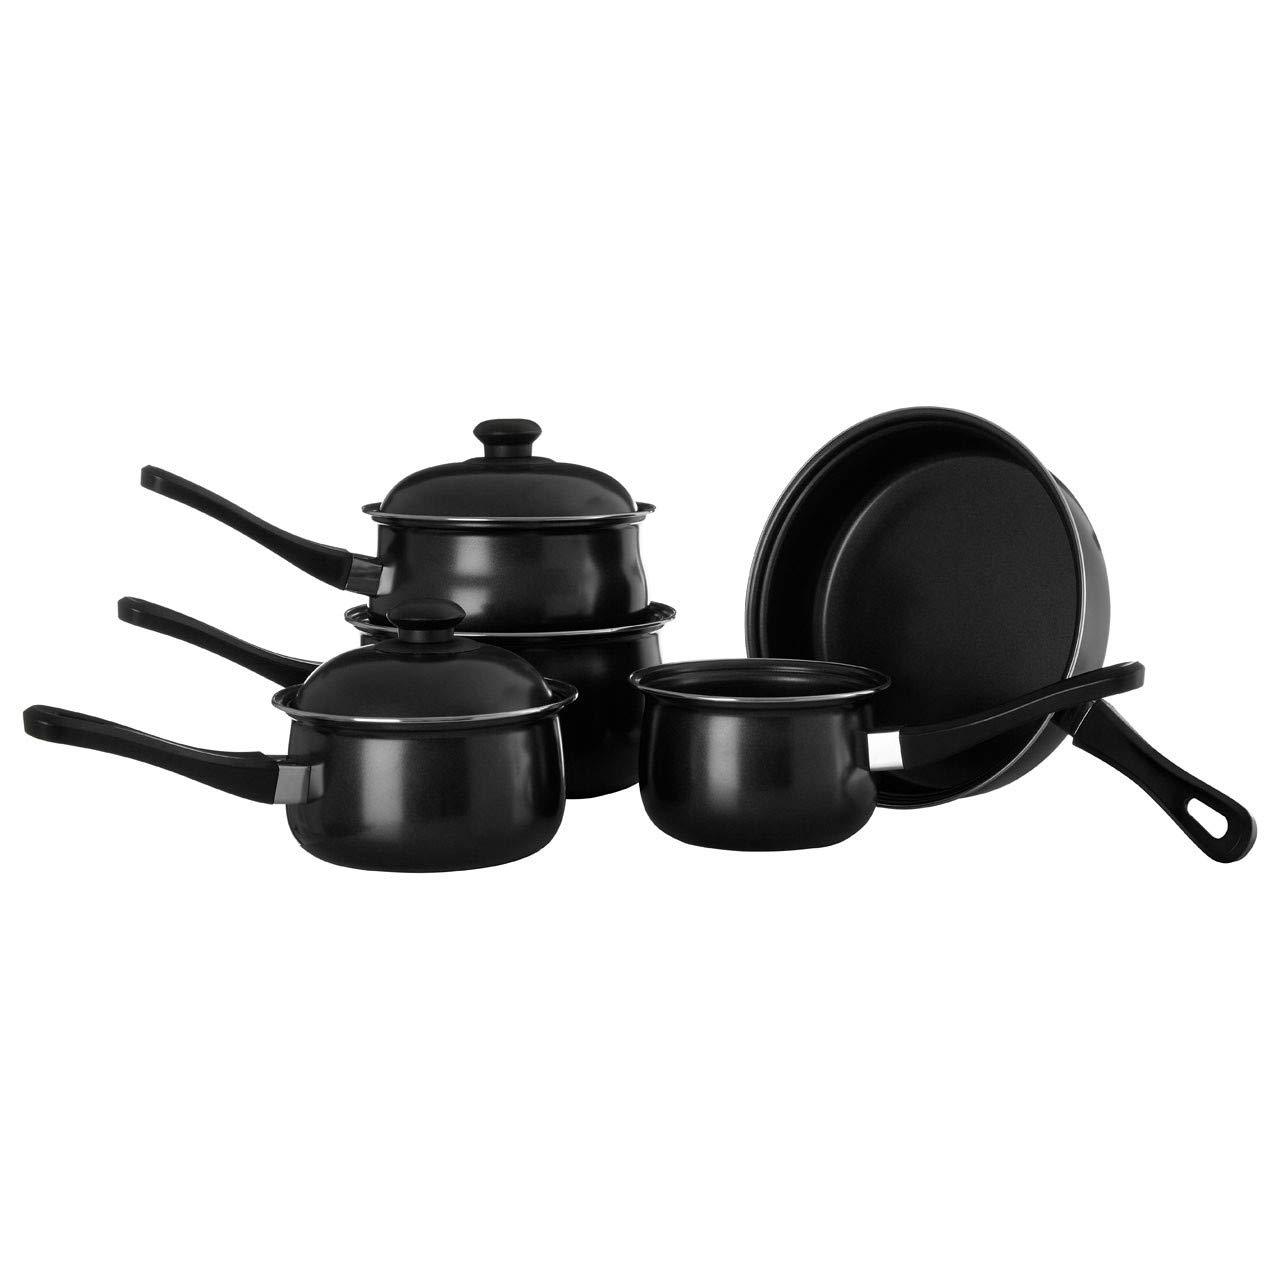 5 PC PIECES BLACK CARBON STEEL BAKELITE HANDLE KITCHEN COOKWARE NON STICK SAUCEPAN FRYING PAN MILK PANS SET WITH LID